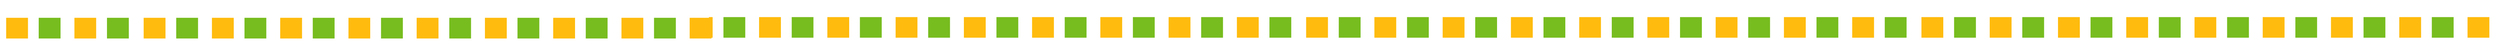 border_yellow-blue.jpg